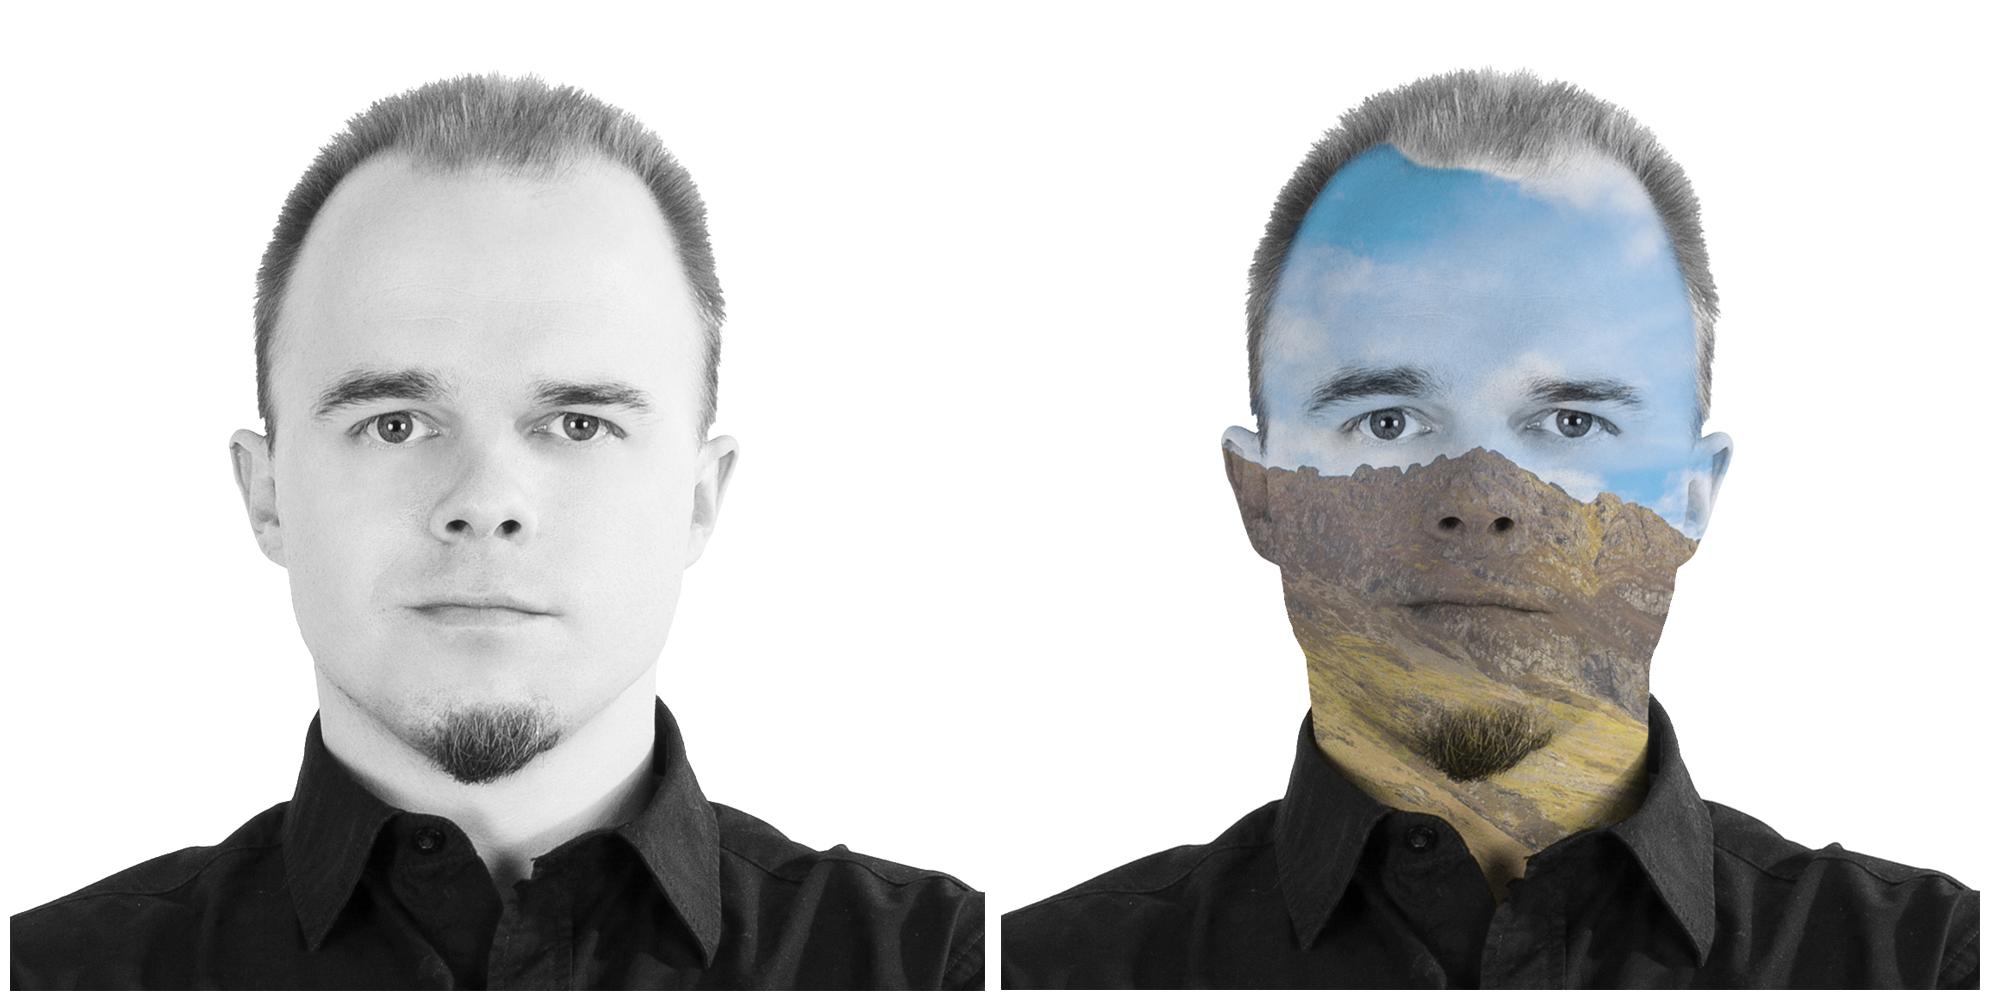 Fotokurs, Doppelbelichtung, Photoshop